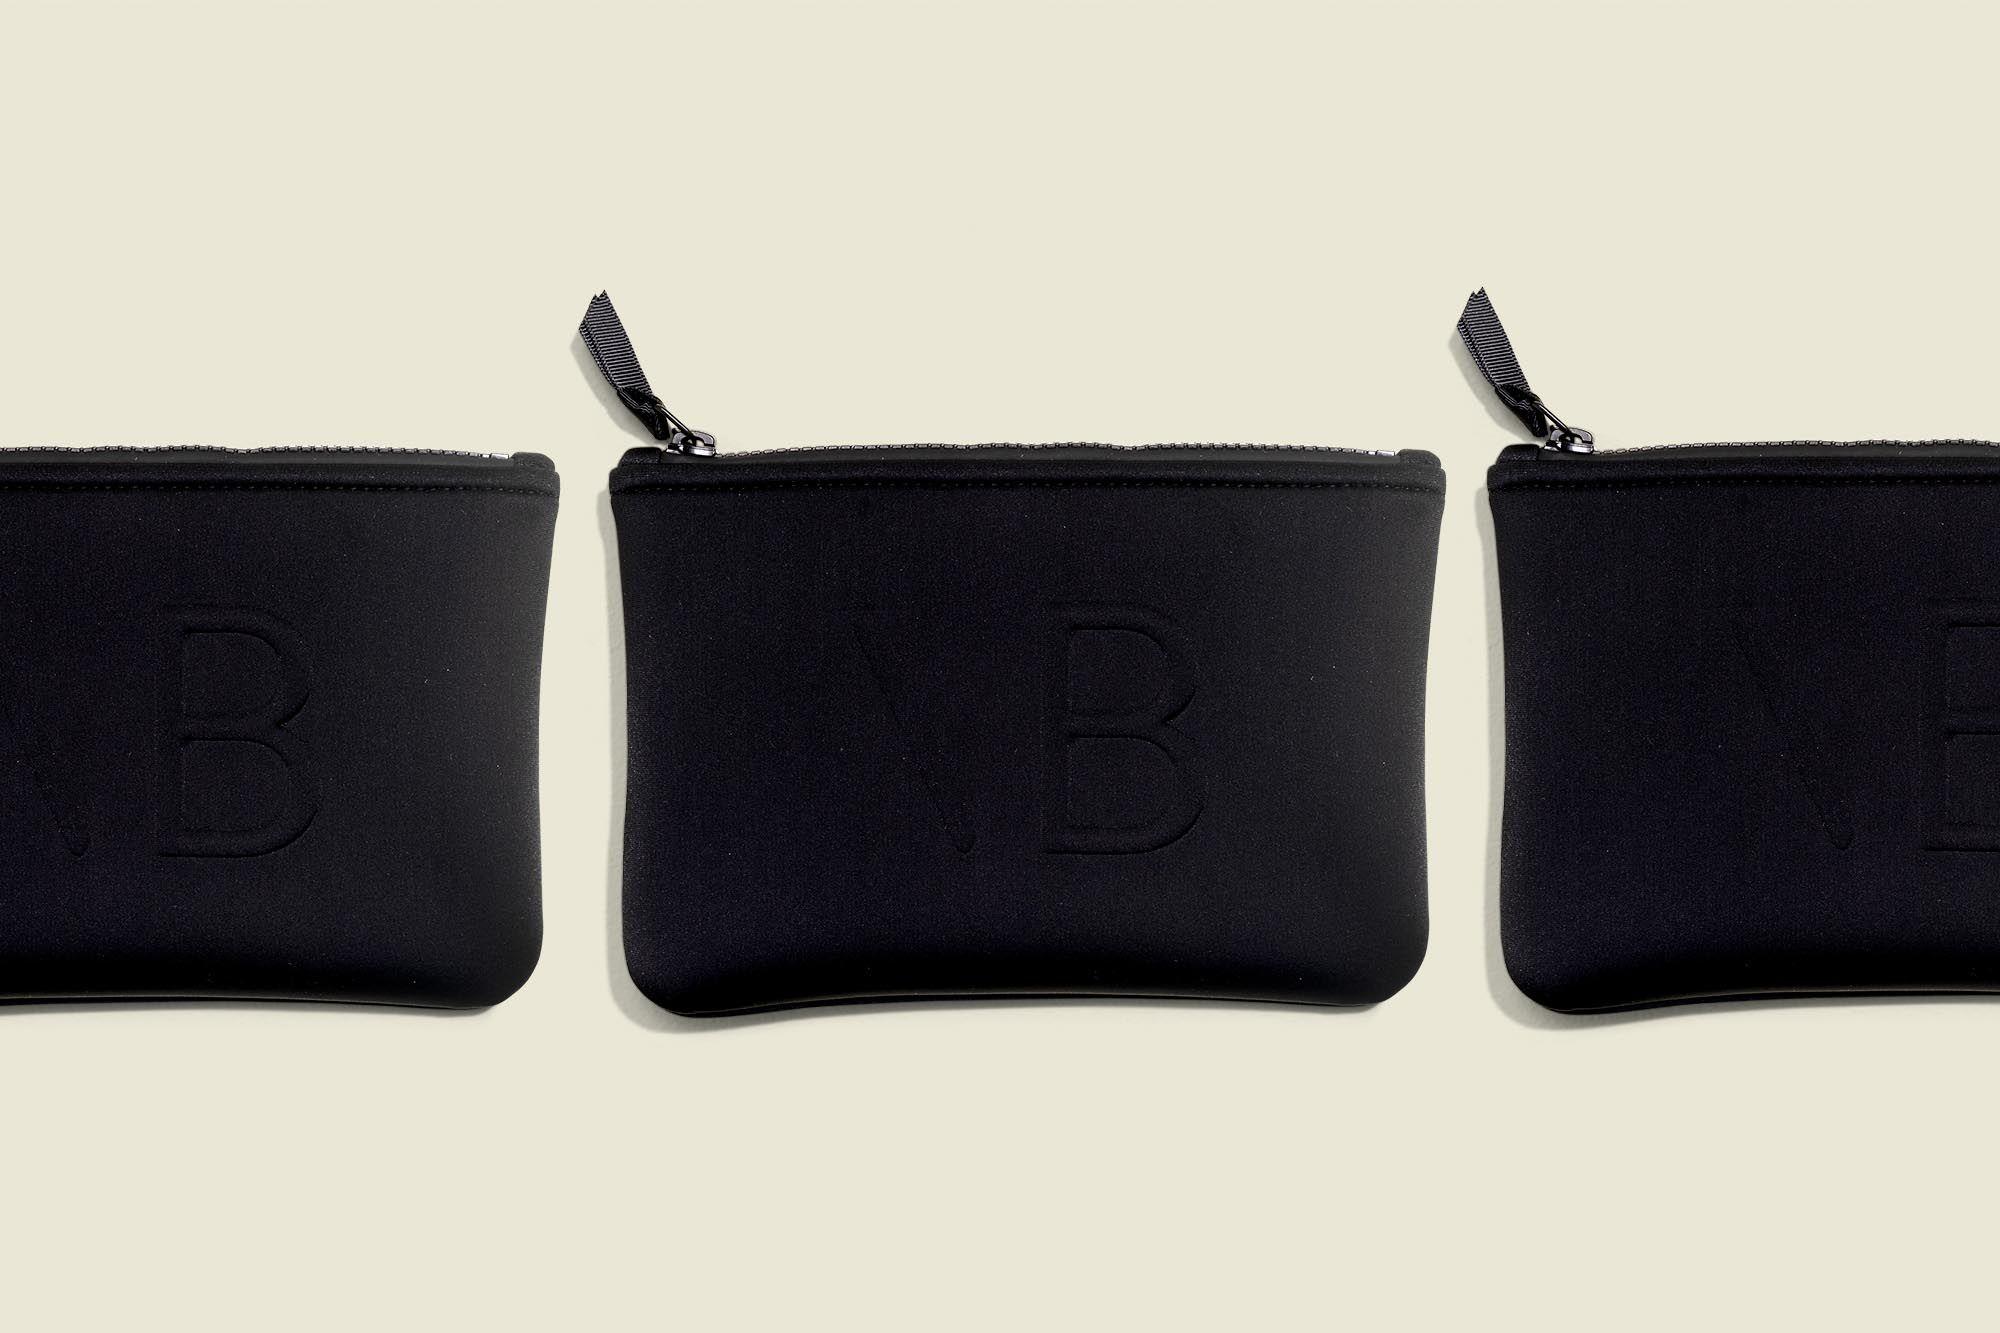 Flat zip pouches